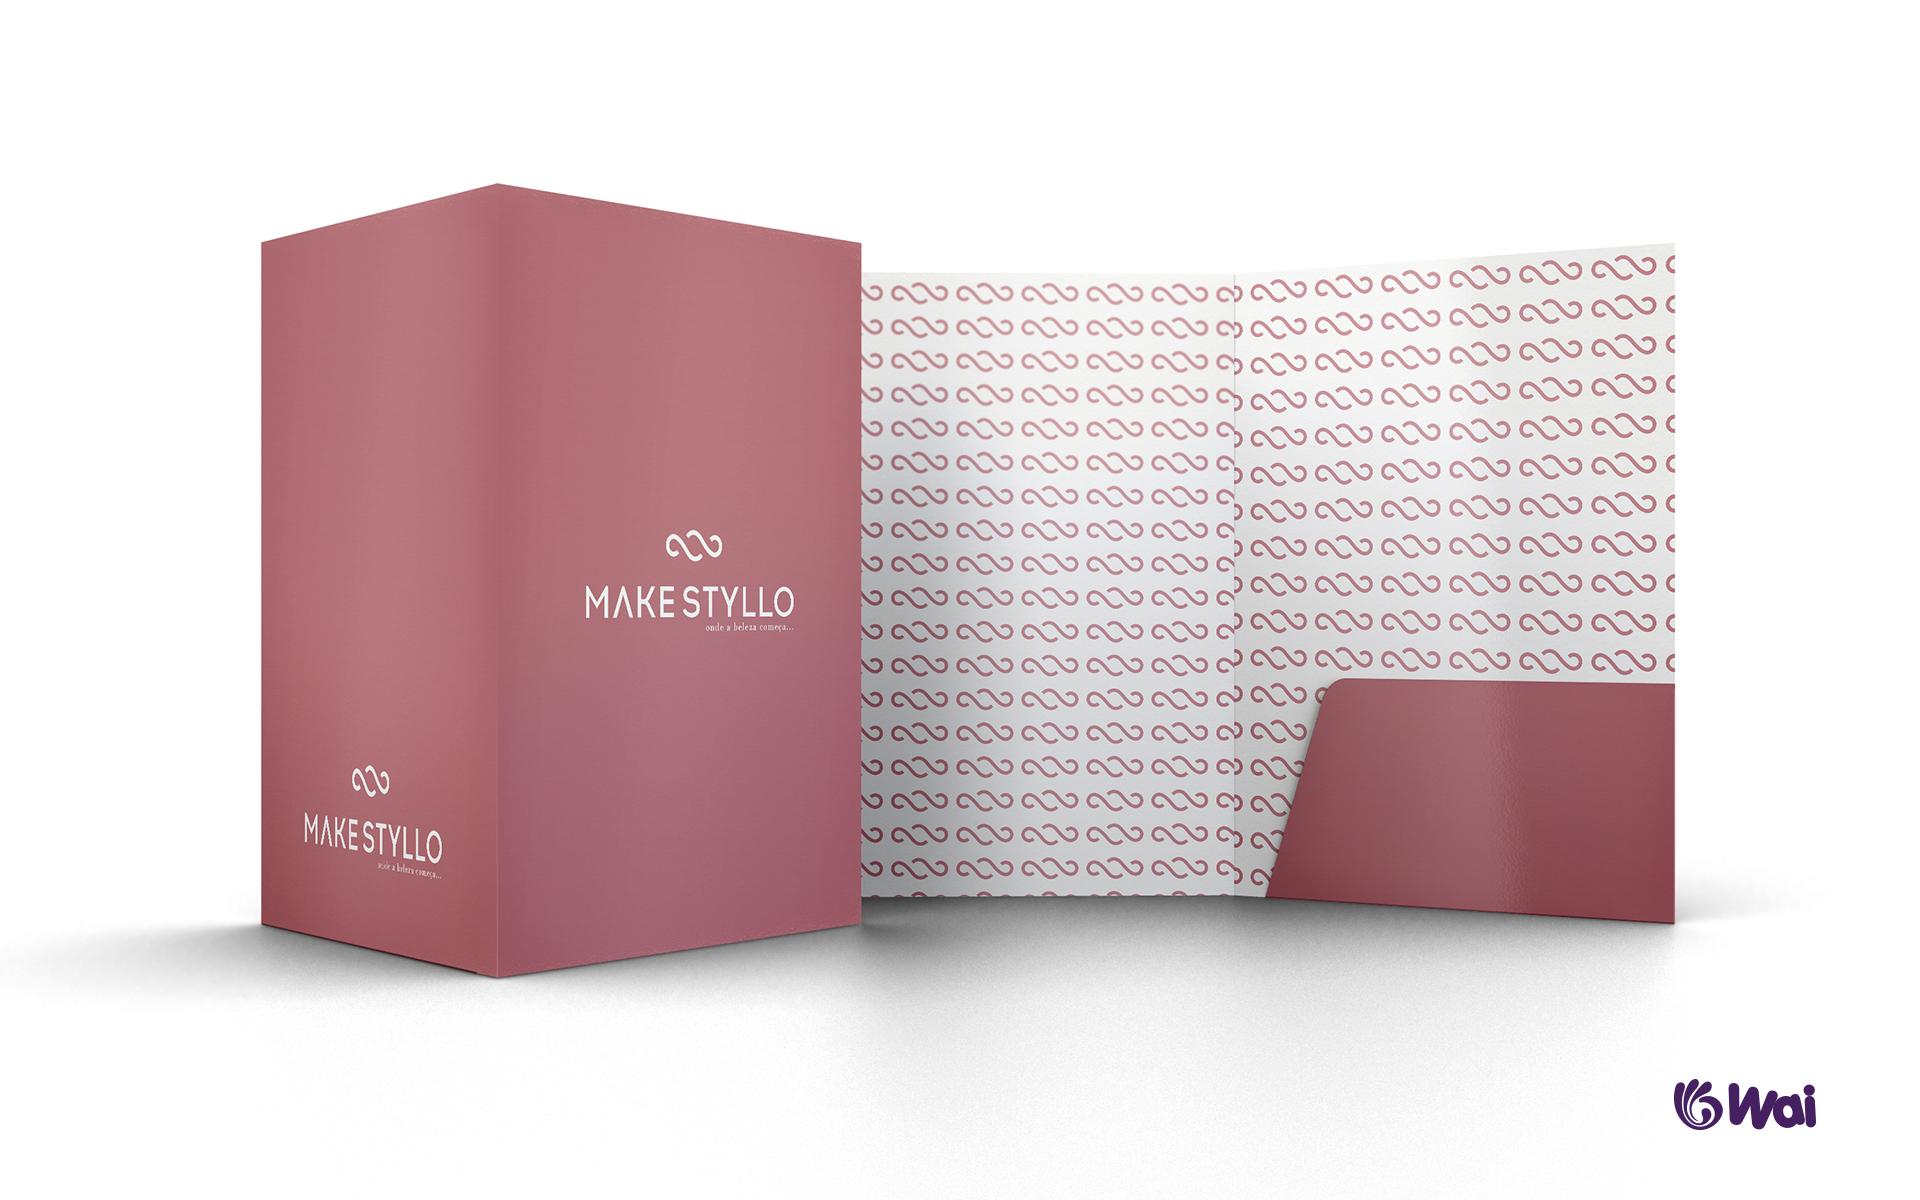 make stillo Make Stillo File Folder Mockup 08